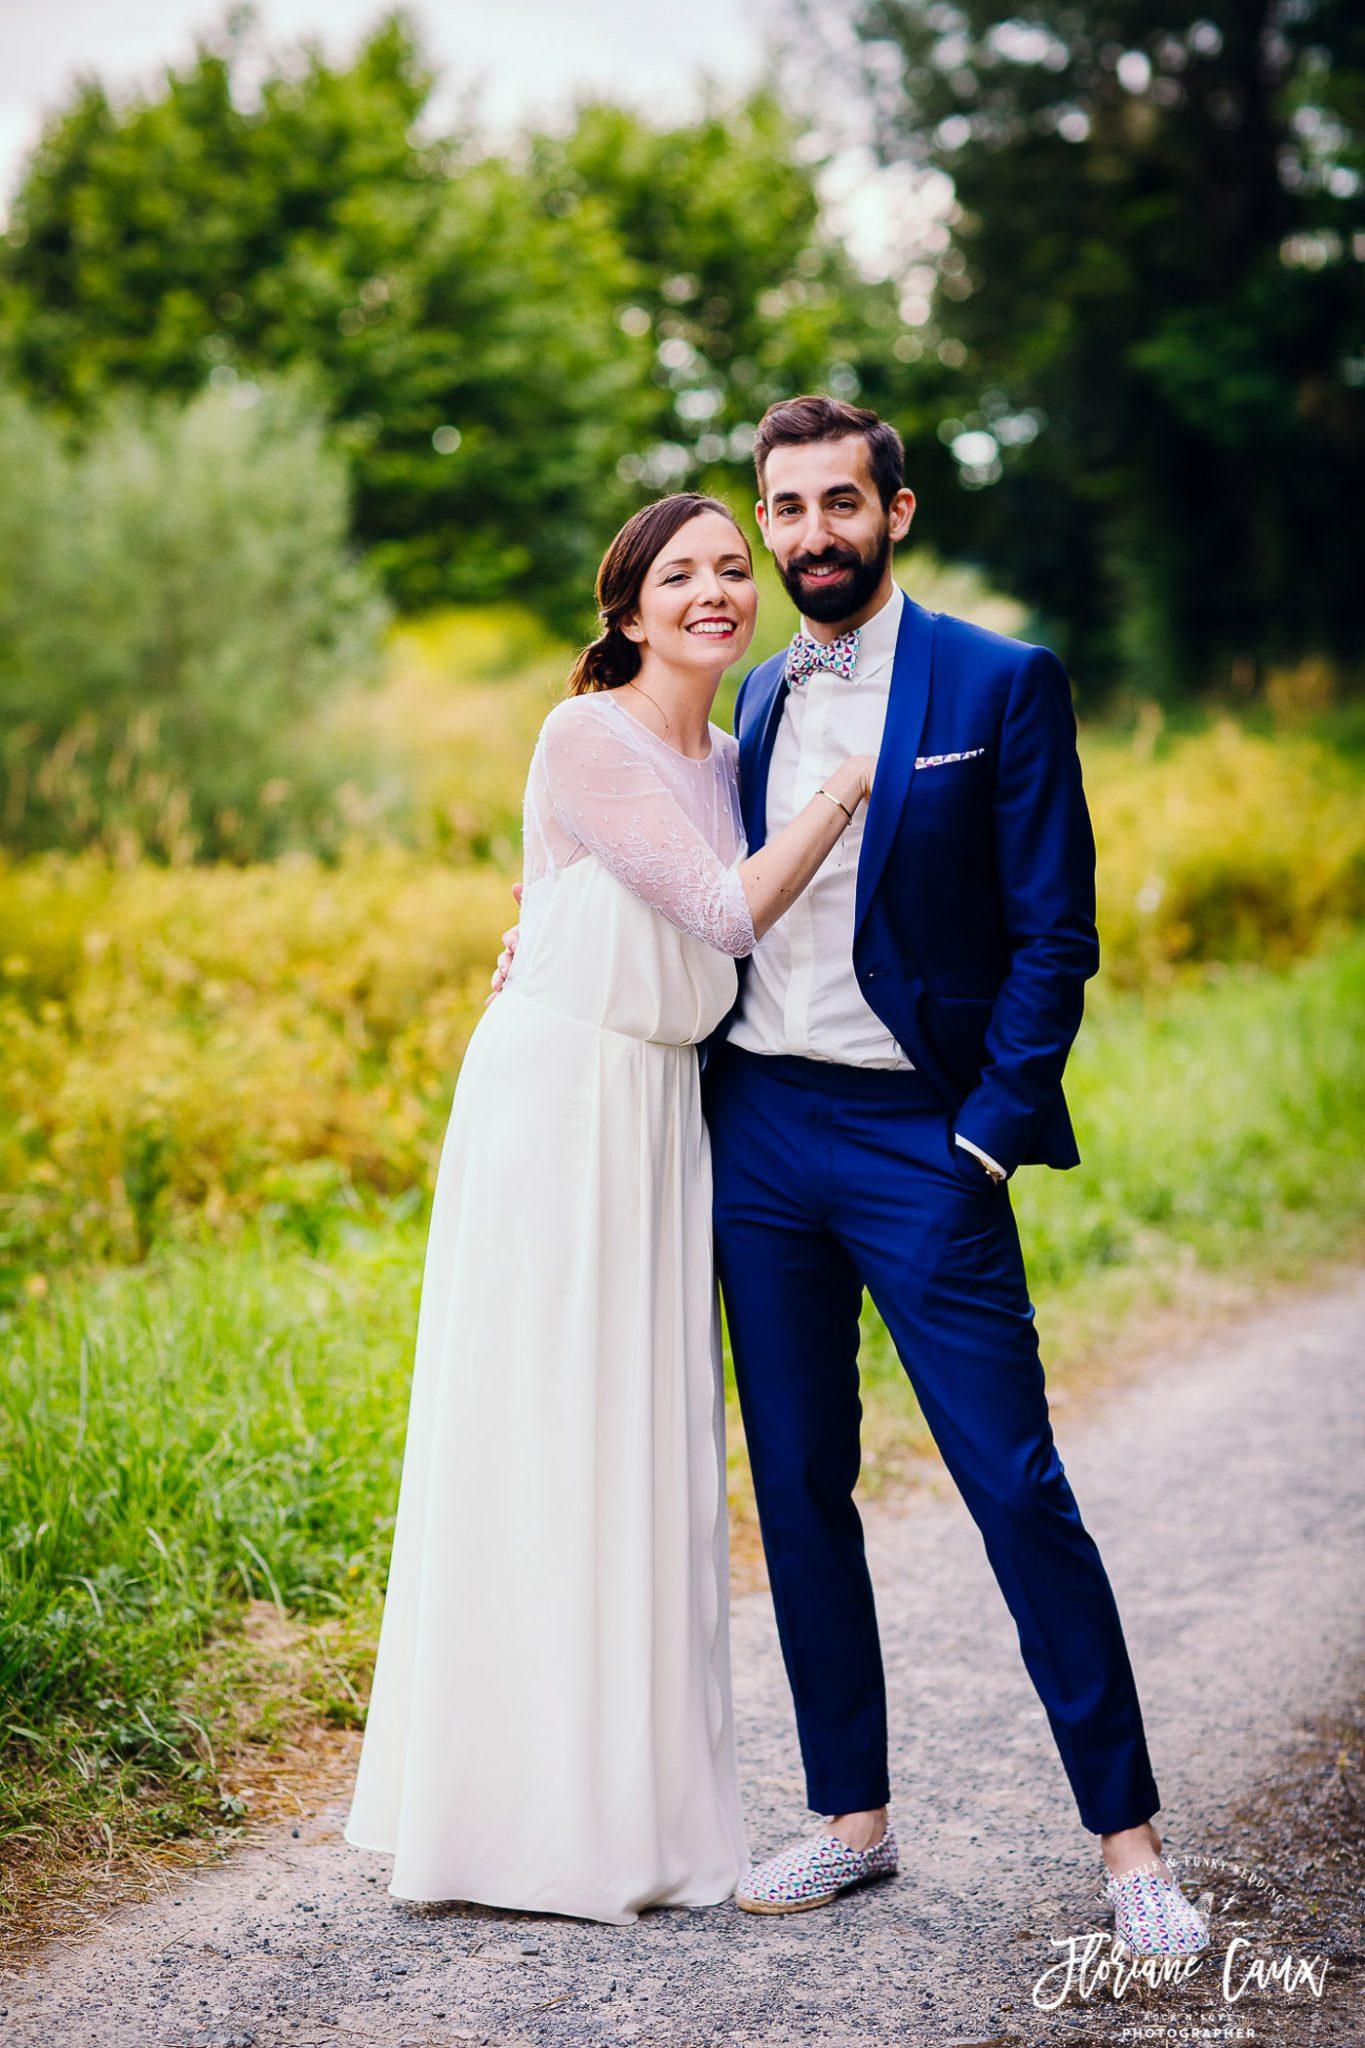 photographe-mariage-pays-basque-Floriane-Caux (40)